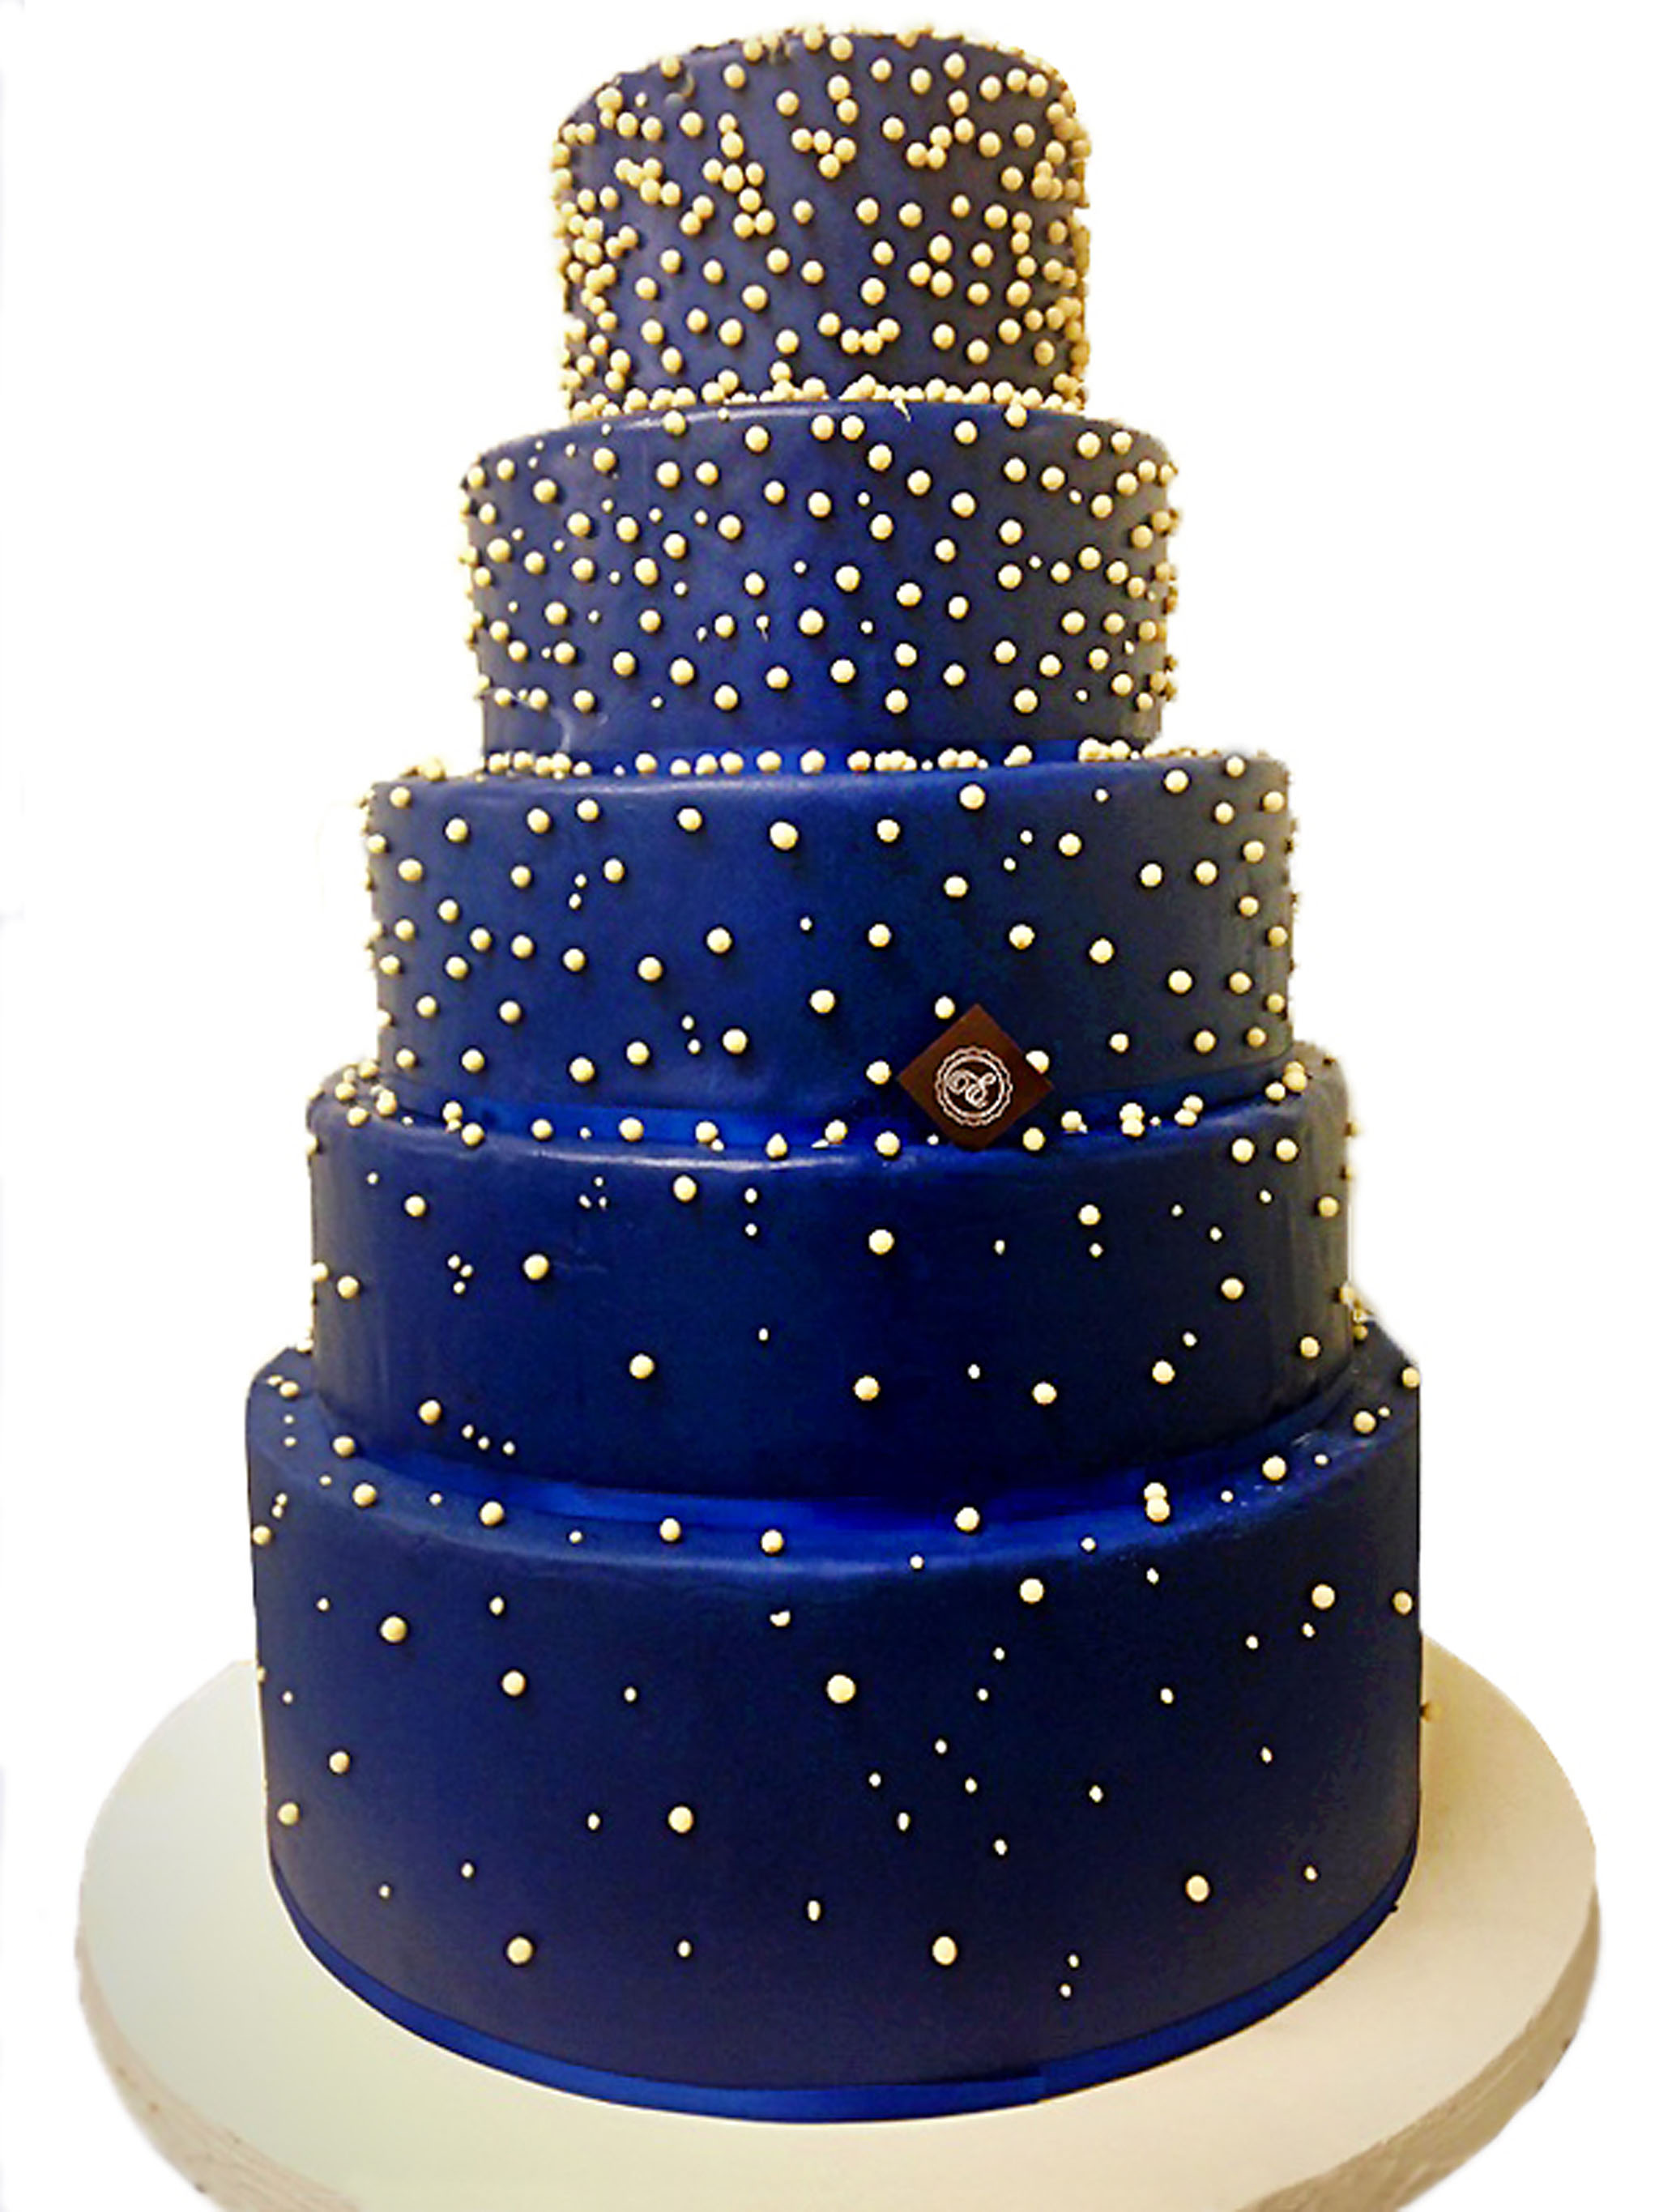 Wedding Cake Gâteau De Mariage Erisay Réceptions